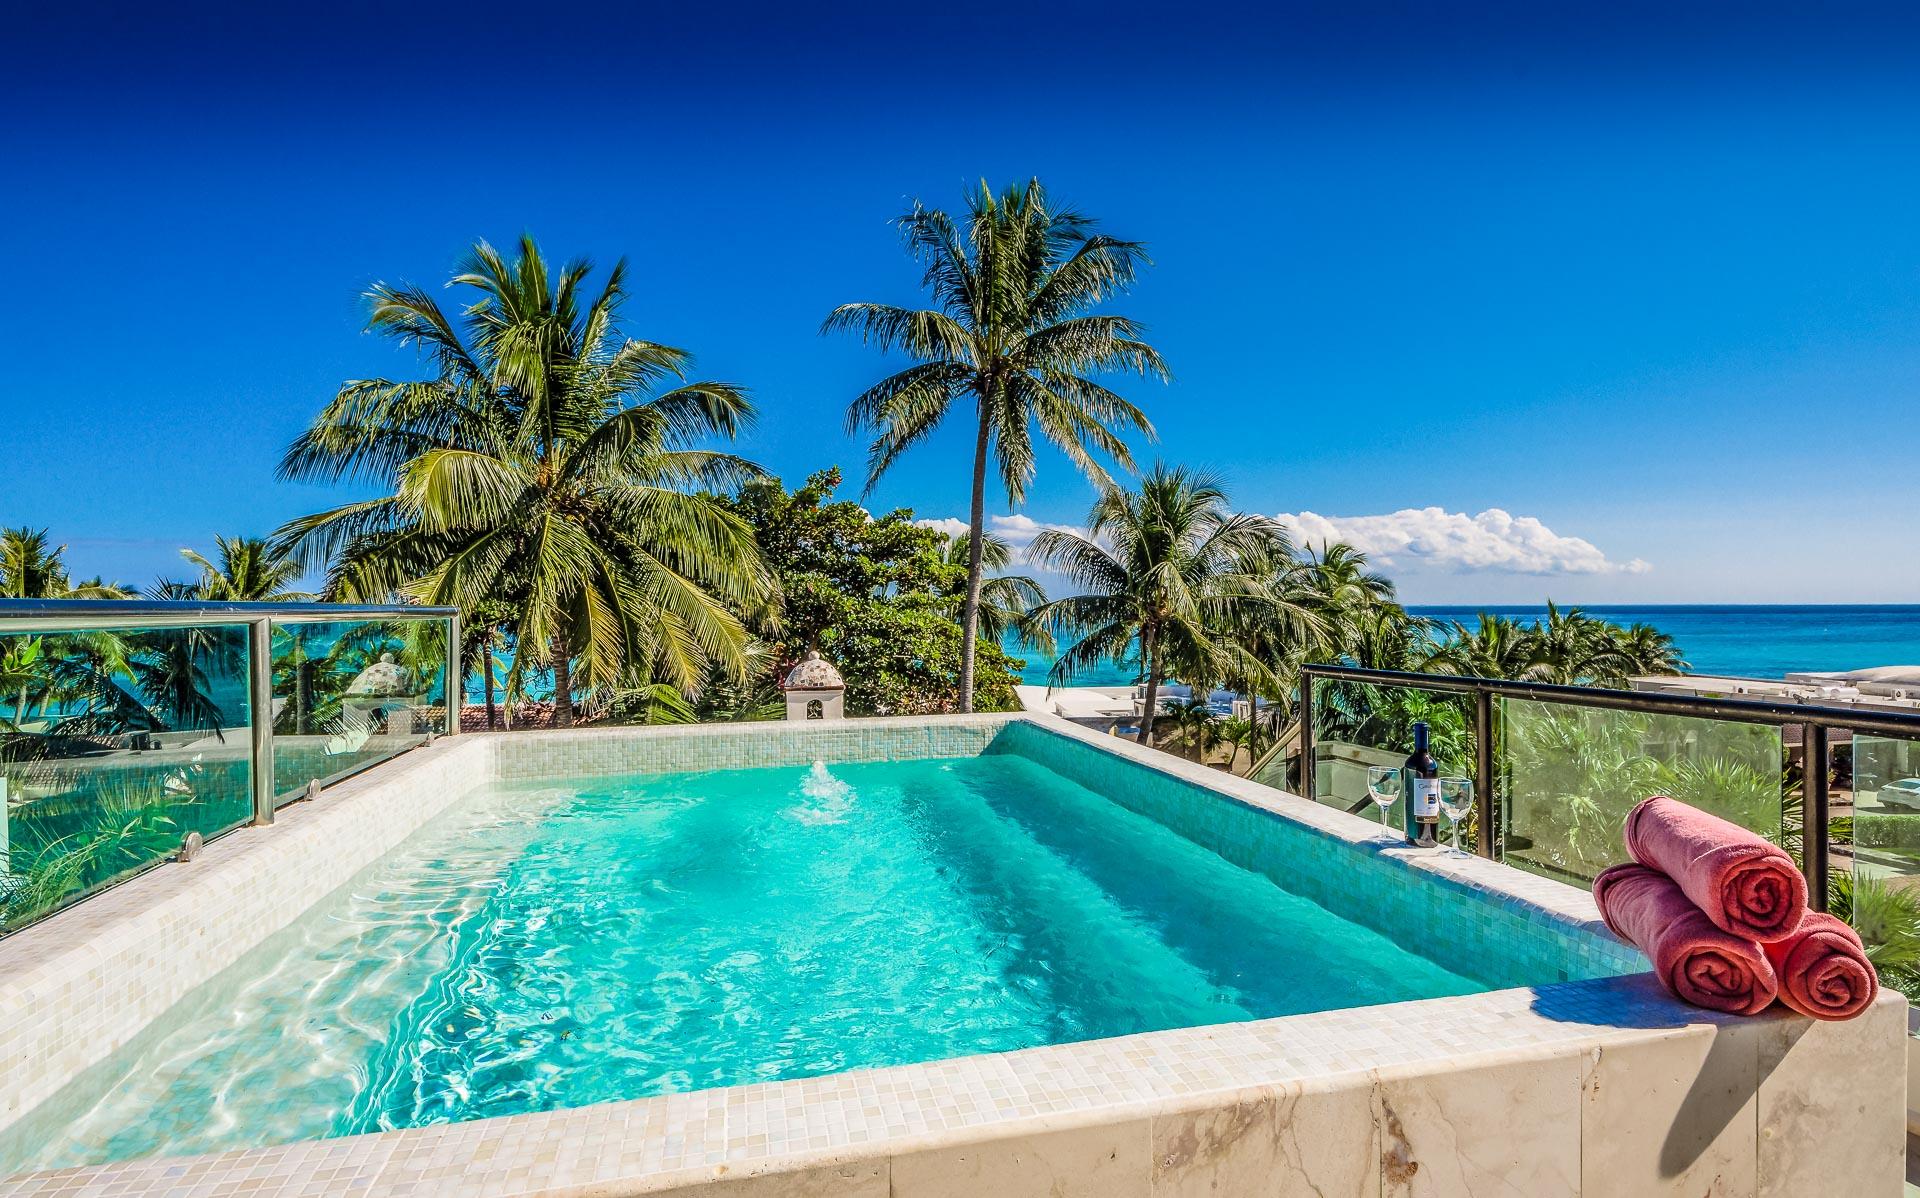 Casa Nikki - Playa del Carmen, Quintana Roo, Mexico